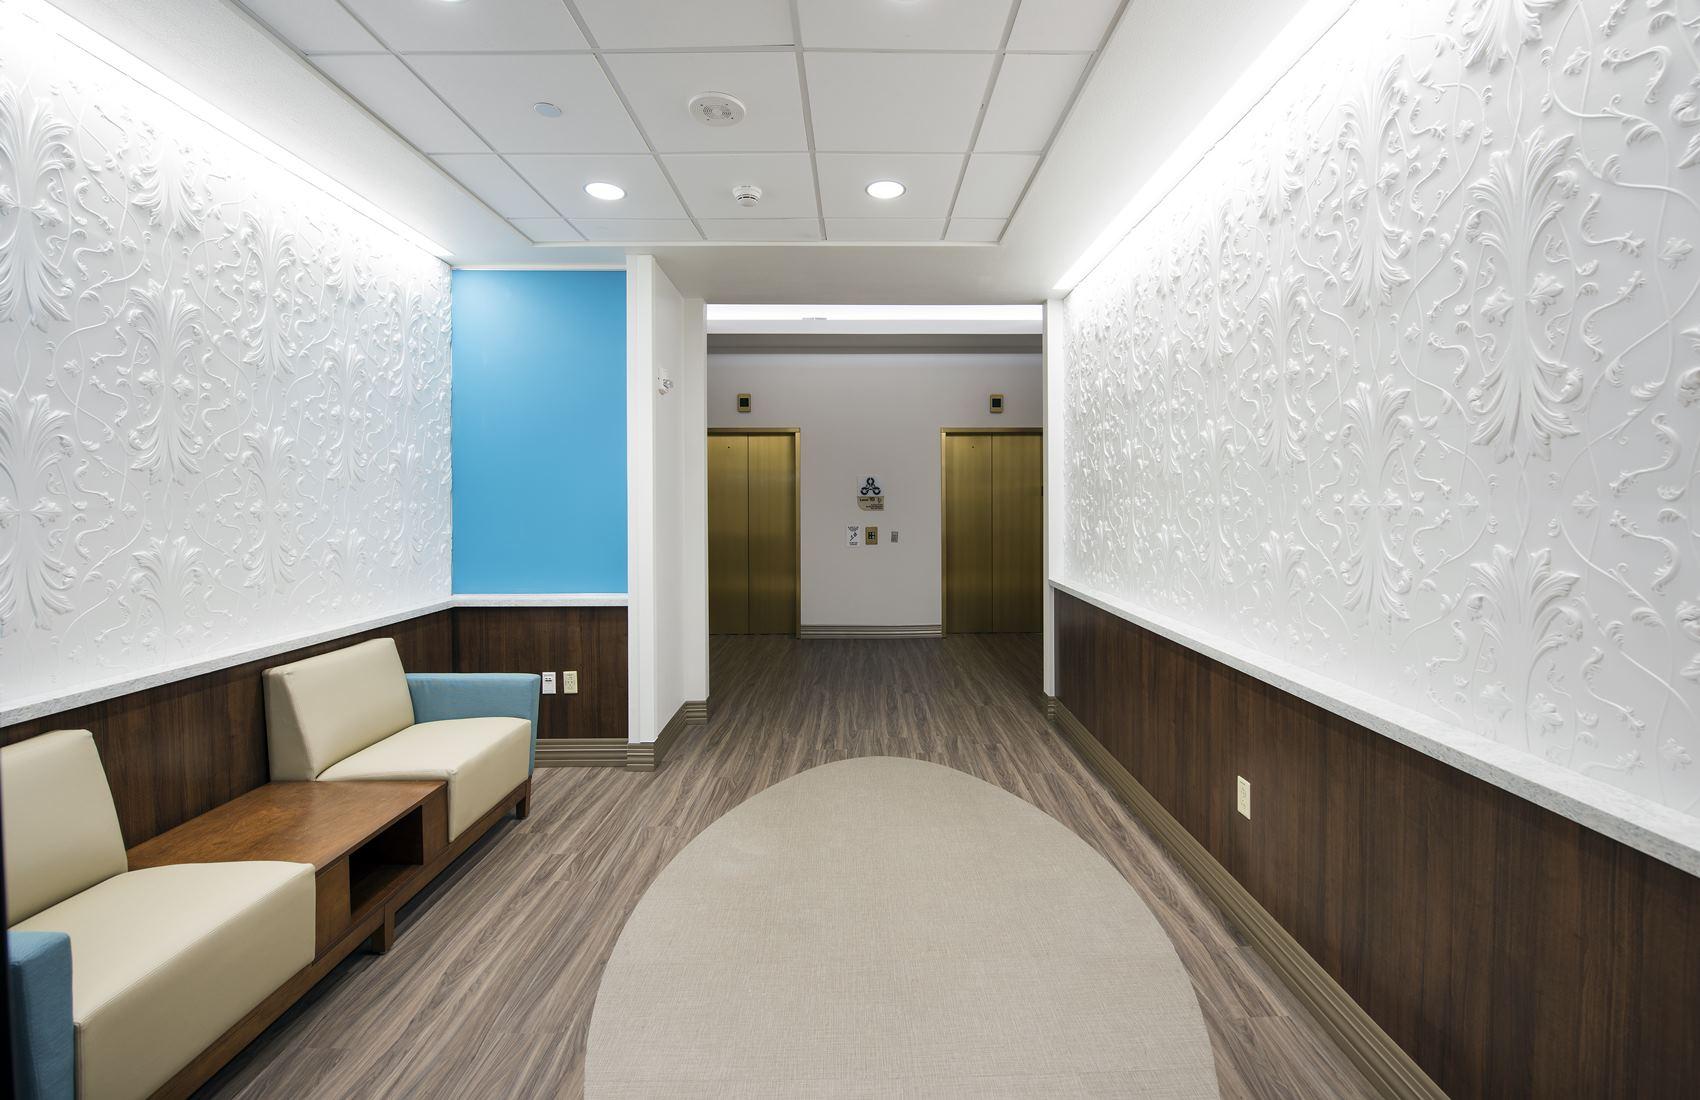 Hallway inside Winnie Palmer Hospital for Women and Children